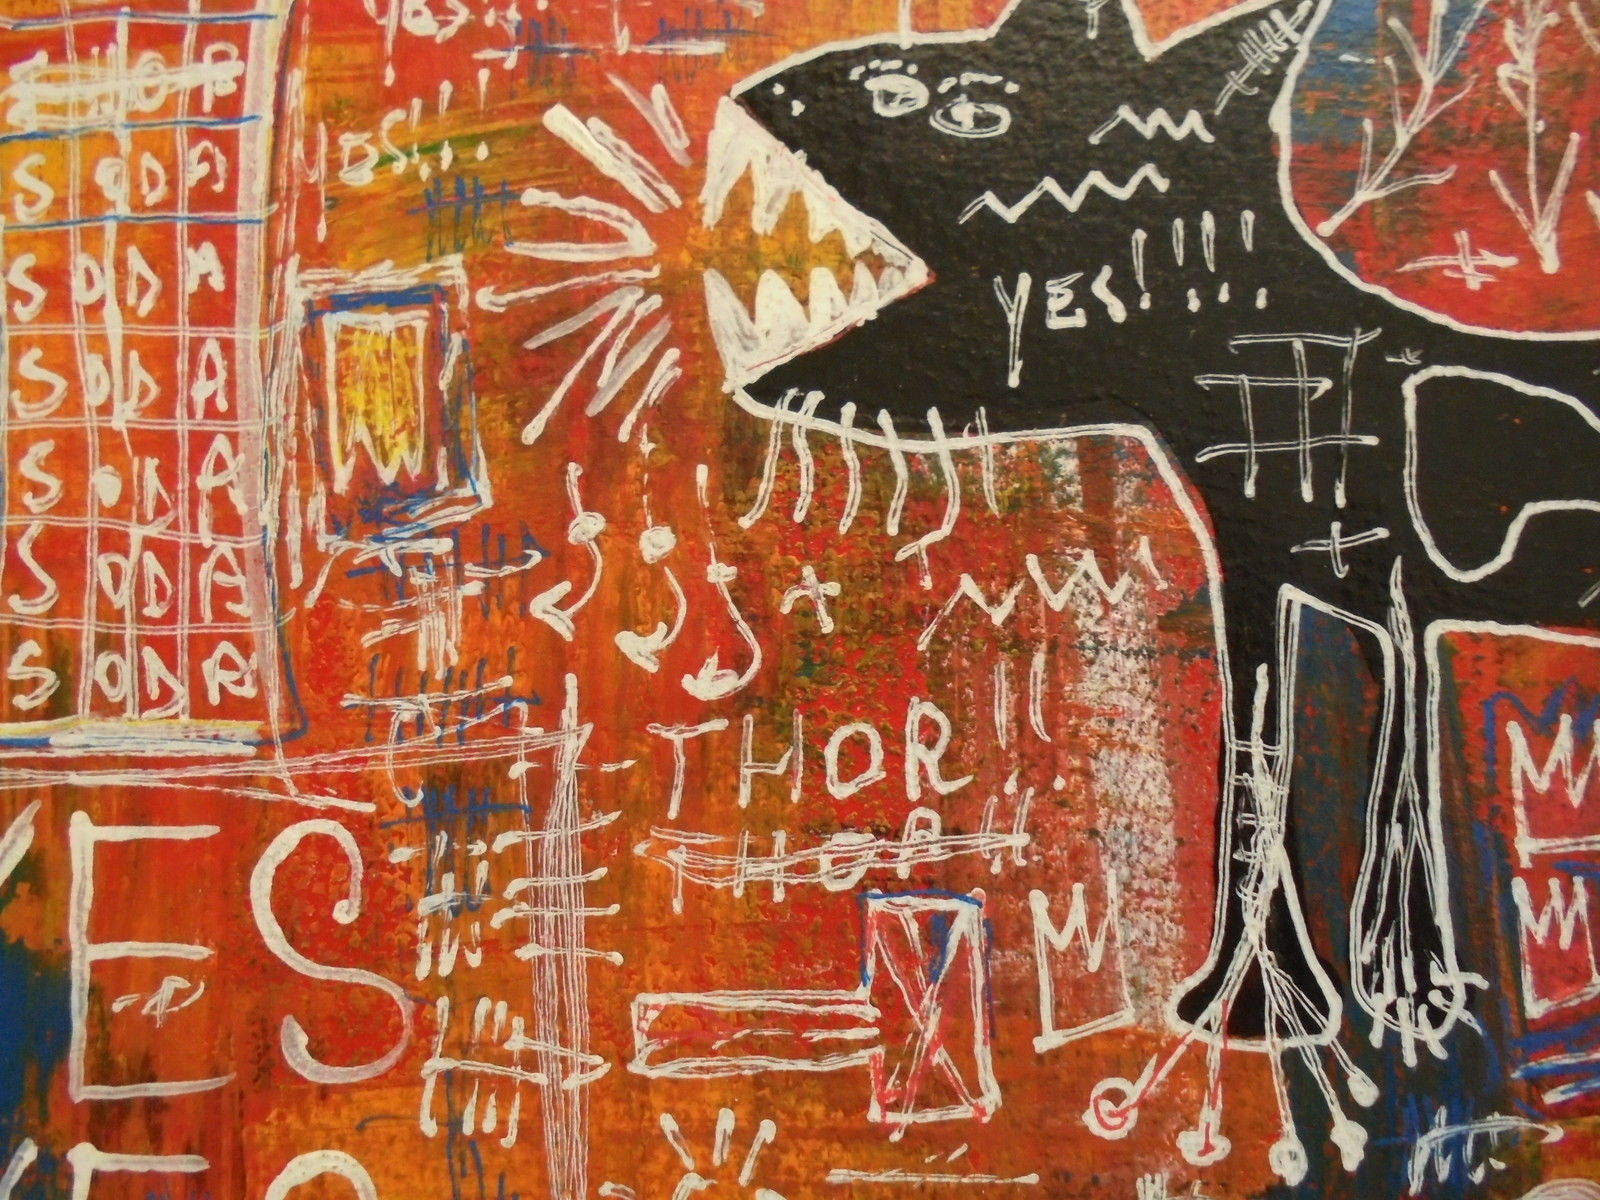 Inspirational Quotes Hd Wallpapers Free Download Basquiat Hd Wallpaper Pixelstalk Net